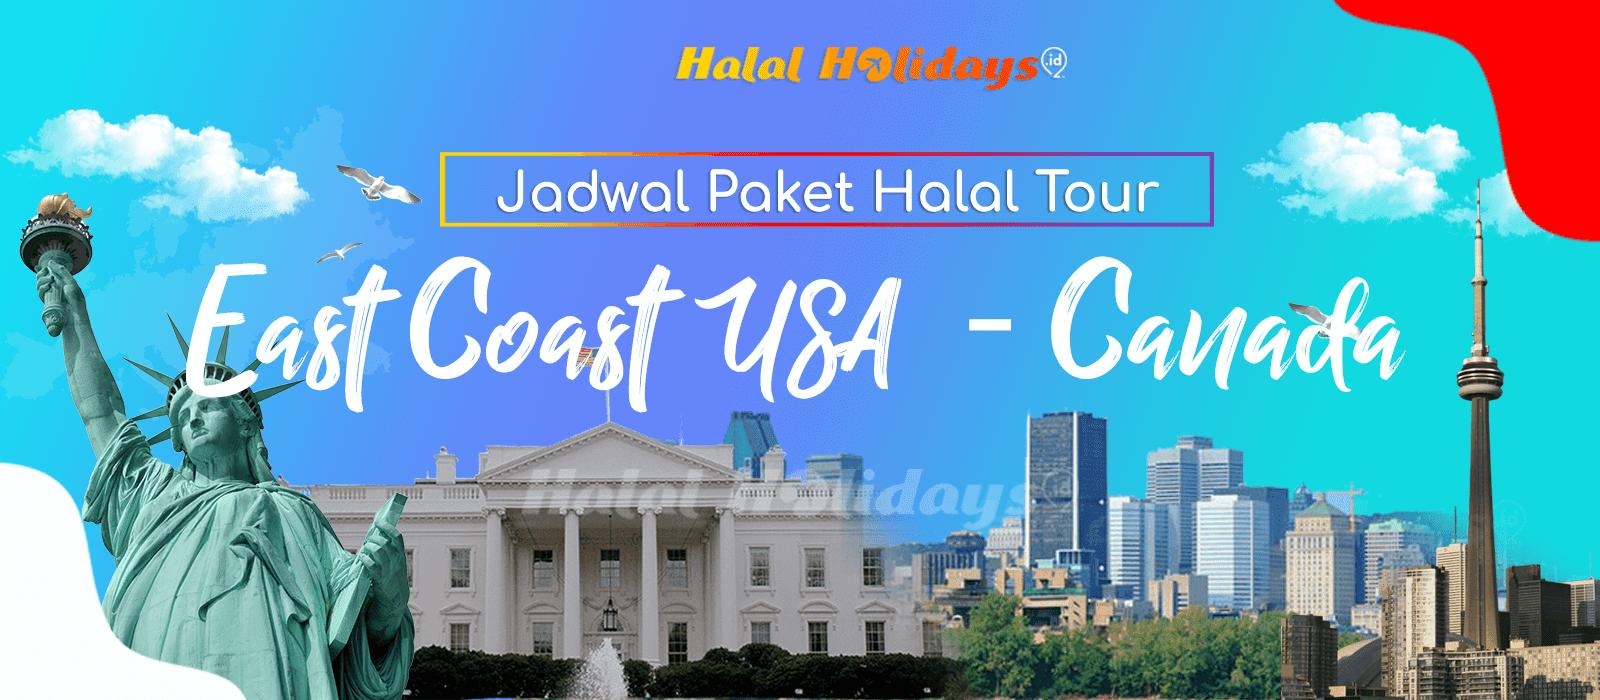 Paket Wisata Halal Tour Amerika East Coast USA Canada Murah Tahun 2022 2023